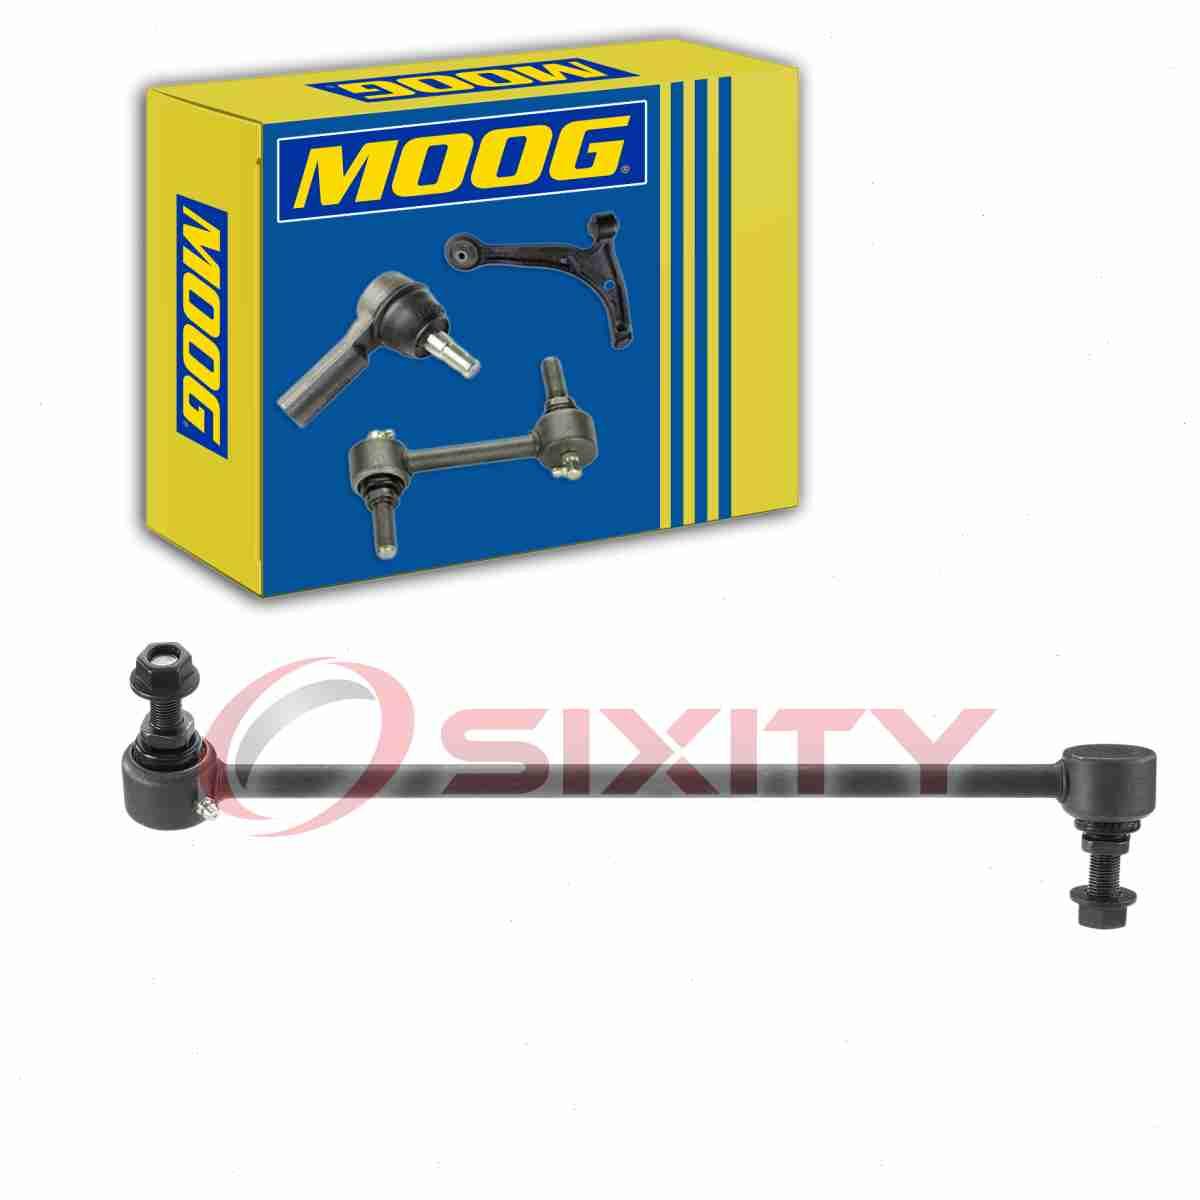 MOOG Front Left Suspension Stabilizer Bar Link for 2011-2013 Kia Sorento lo